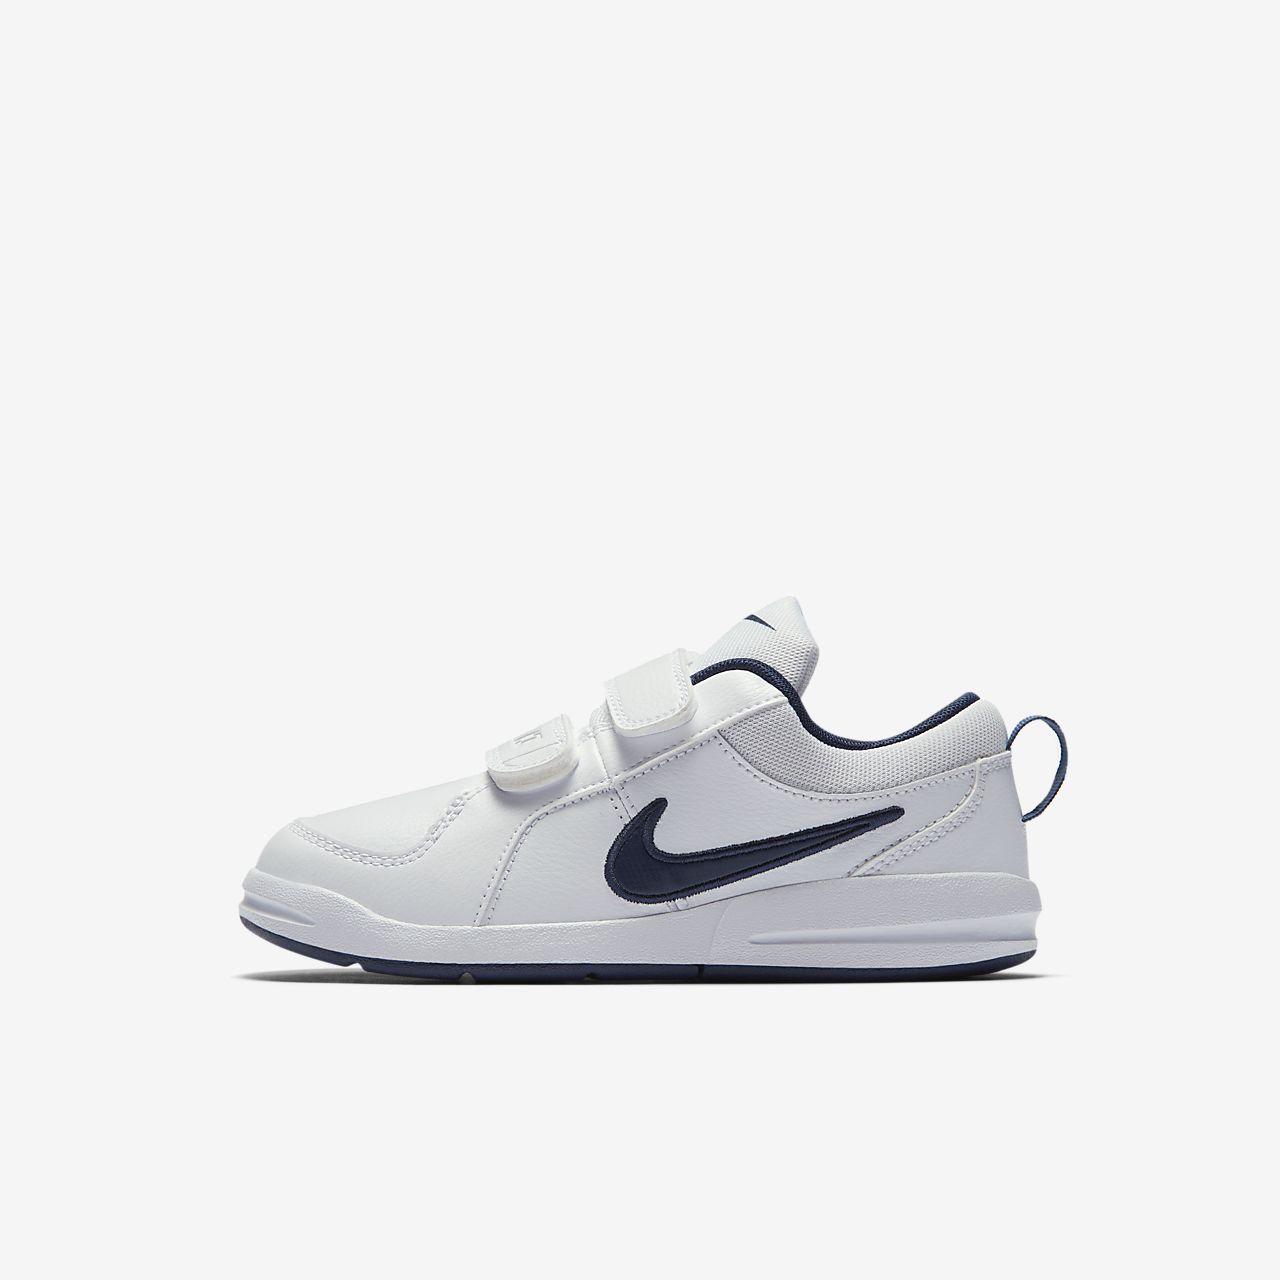 4 GarçonCh Pour Nike Petit Chaussure Pico jLSUzqGVMp